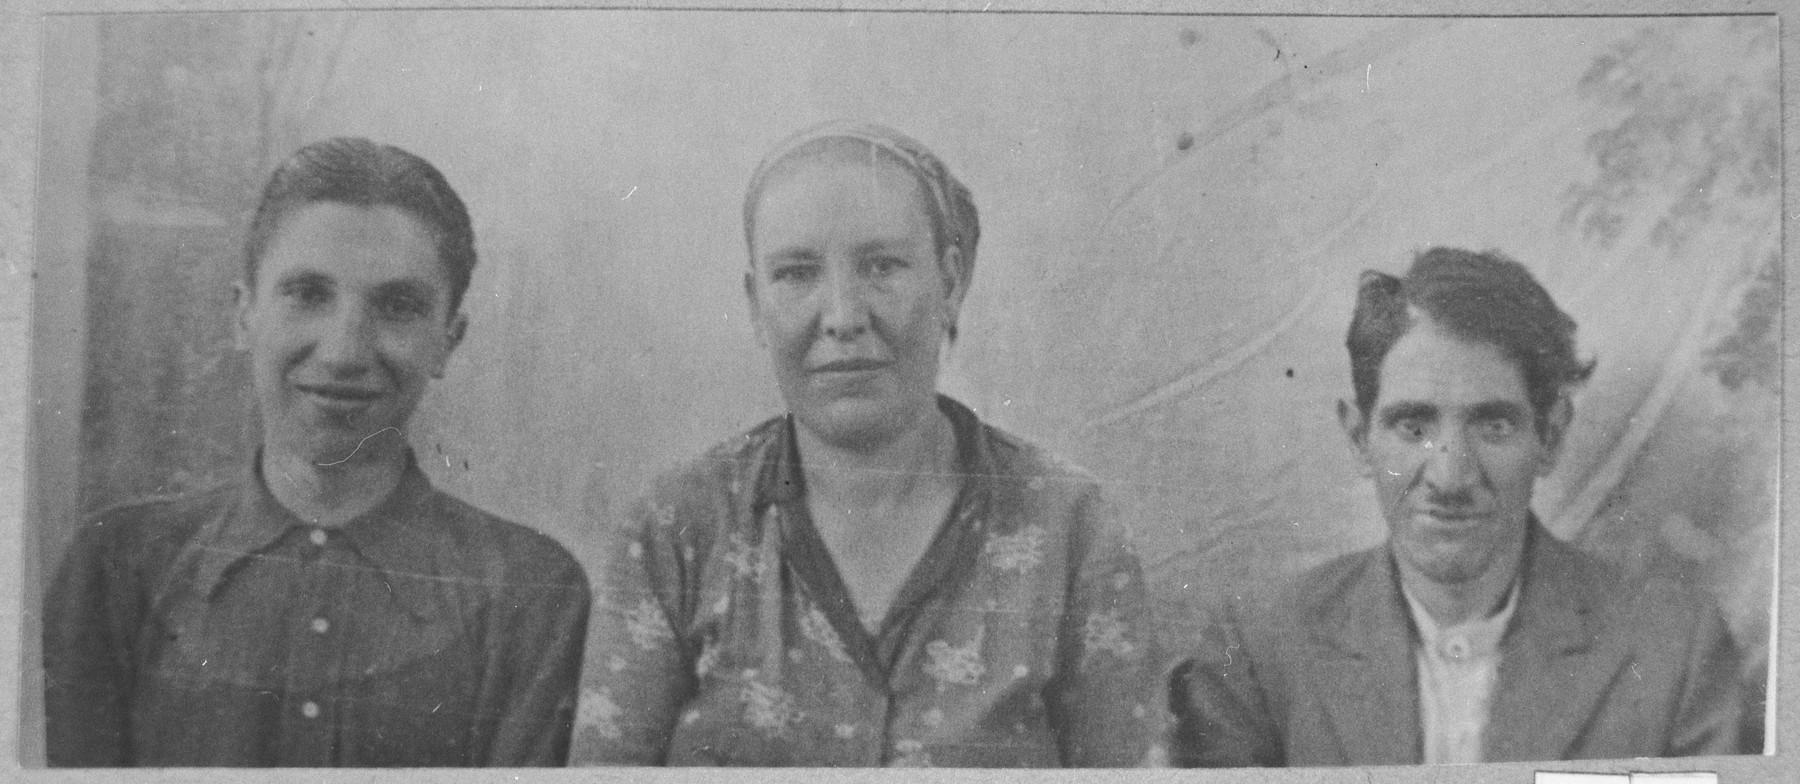 Portrait of Haim Aleshandra, his wife, Sara, and his son, David.  Haim was a Porter and David, a student.  They lived at Avramova 62 in Bitola.